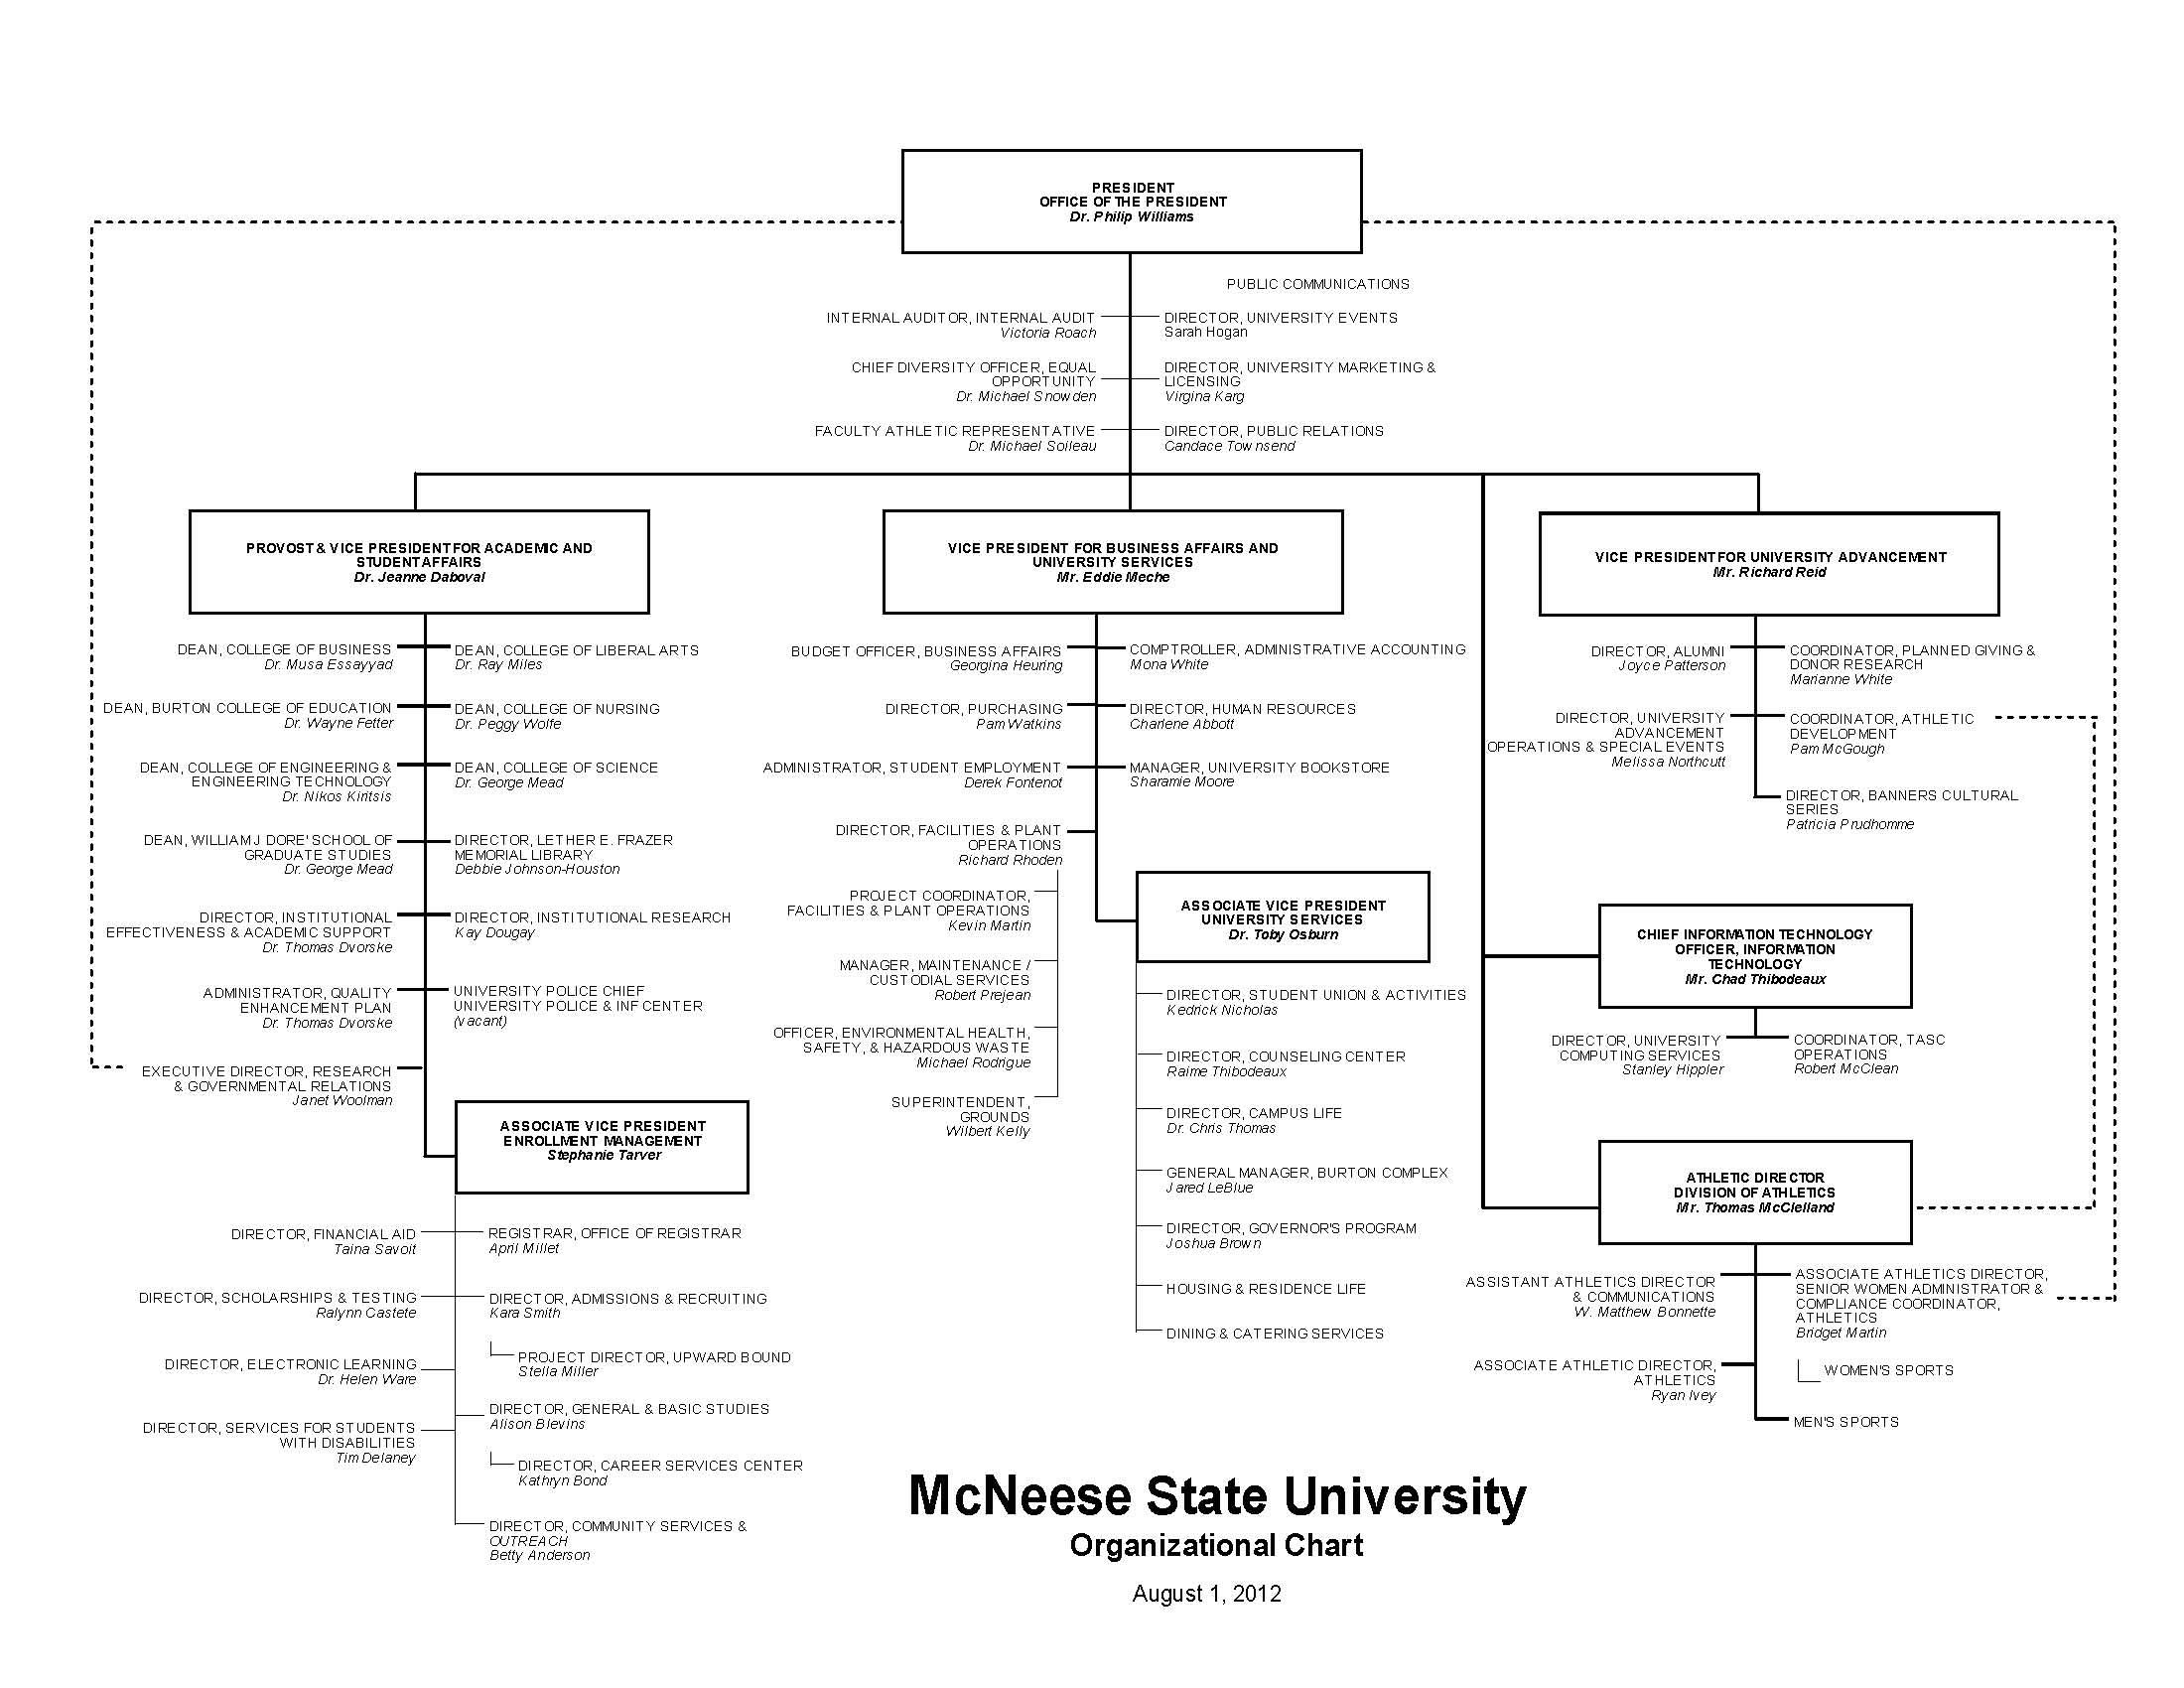 McNeese Organizational Chart as of 2013-2014